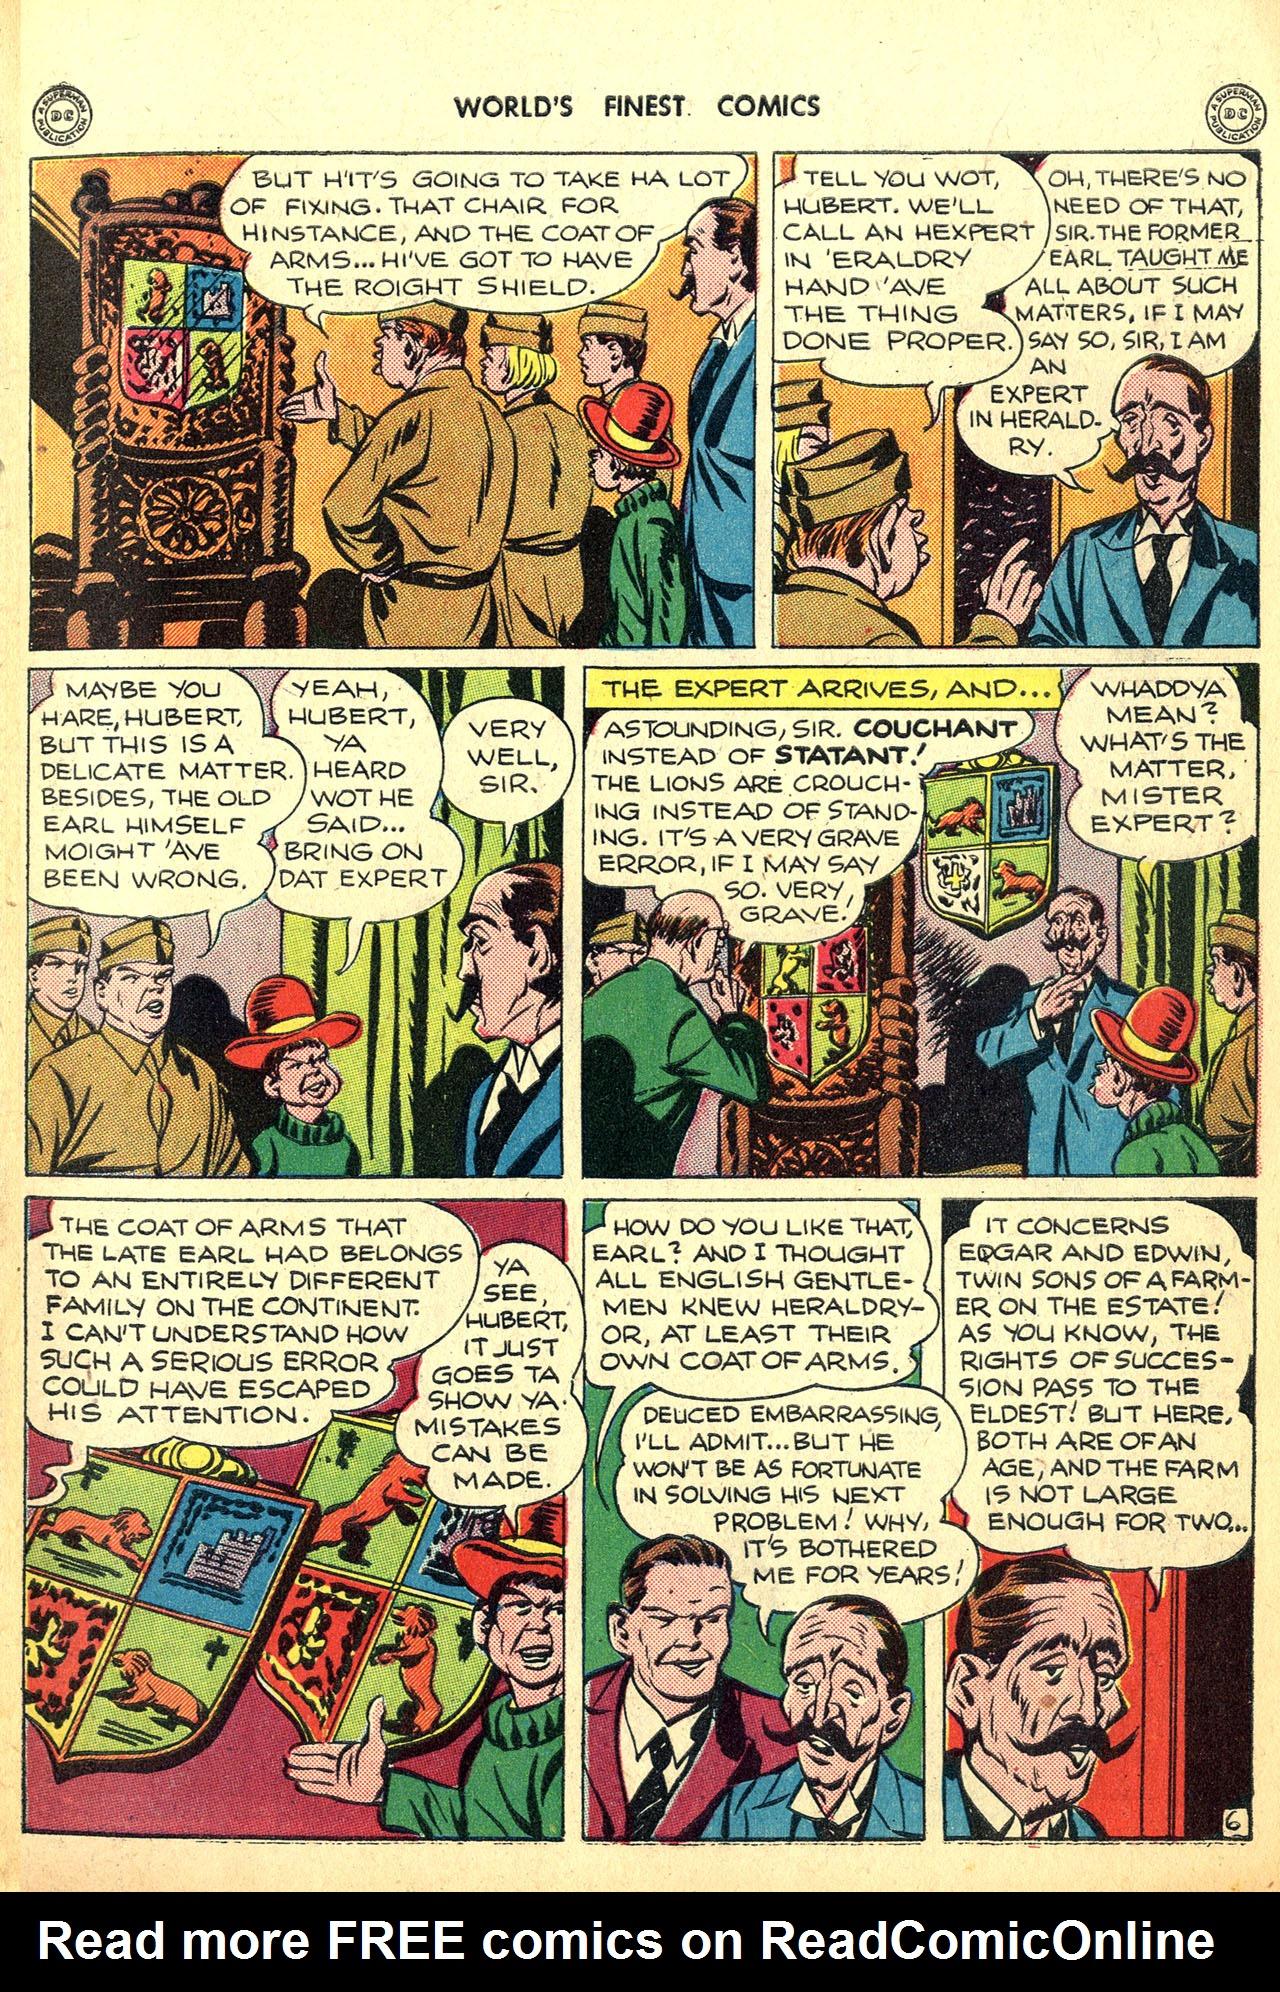 Read online World's Finest Comics comic -  Issue #18 - 41